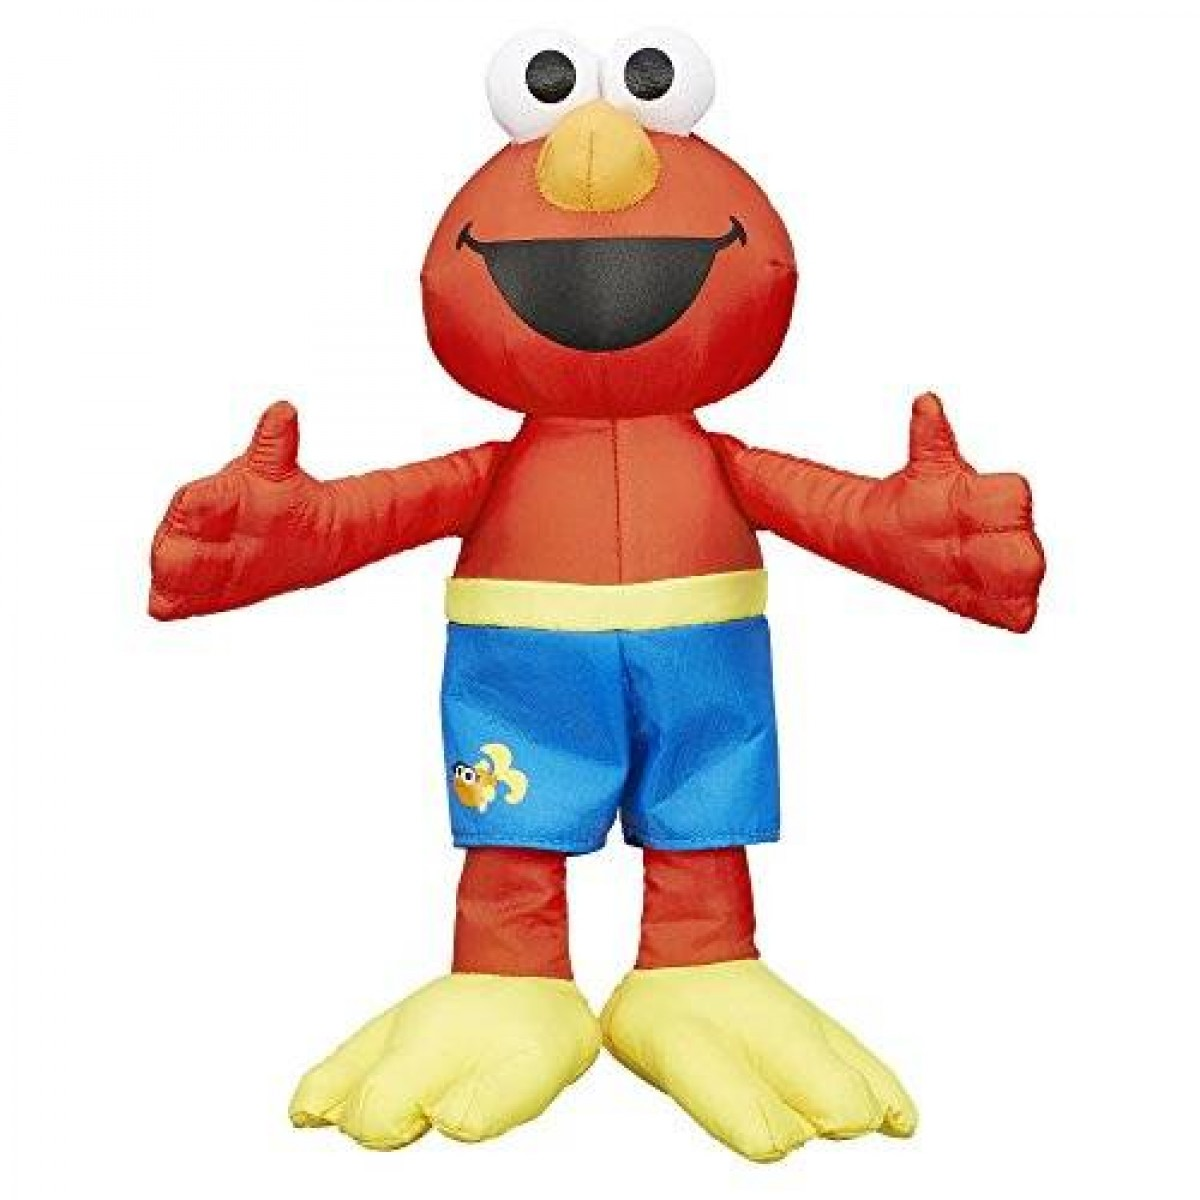 Boneka Sesame Street S Elmo Ss007 1 - Daftar Harga Terupdate Indonesia 4db1ae7265